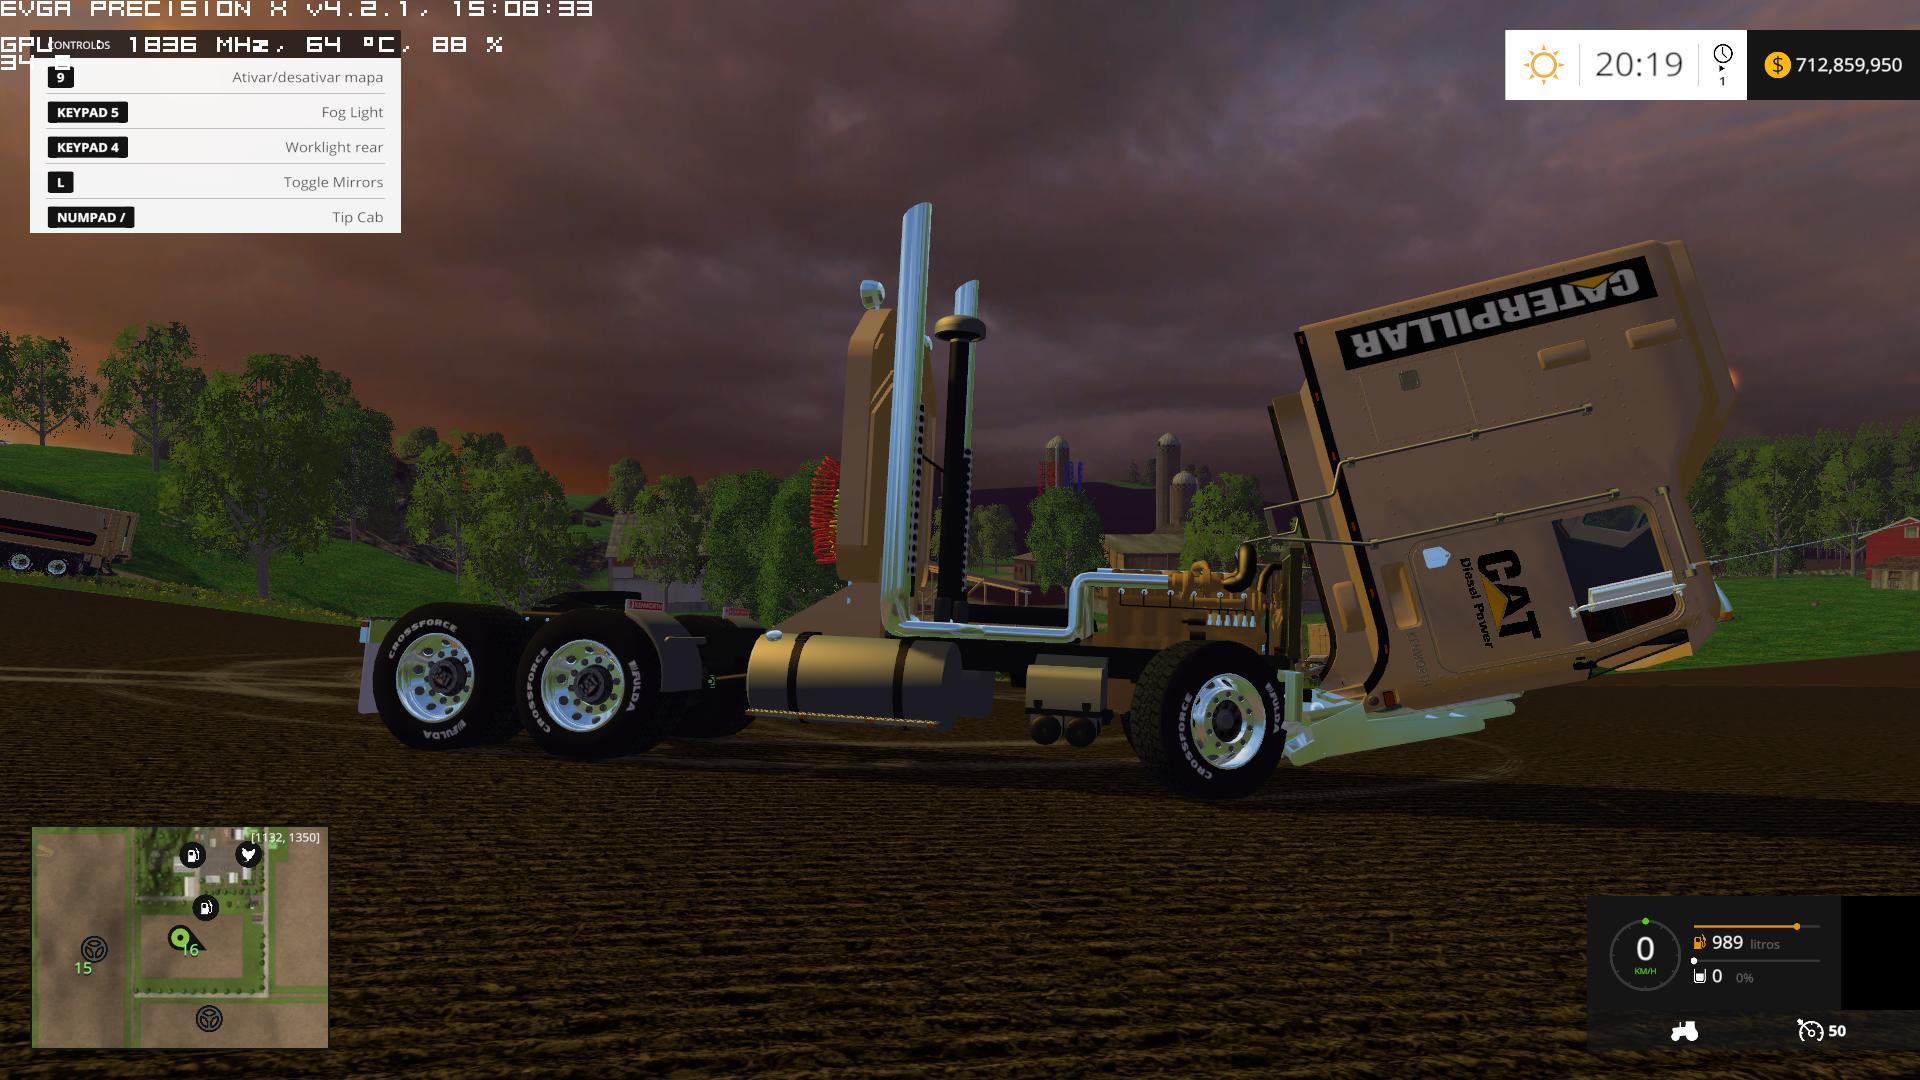 cat kenworth 100 6cc turbo 780 hp truck farming simulator 2019 2017 2015 mod. Black Bedroom Furniture Sets. Home Design Ideas